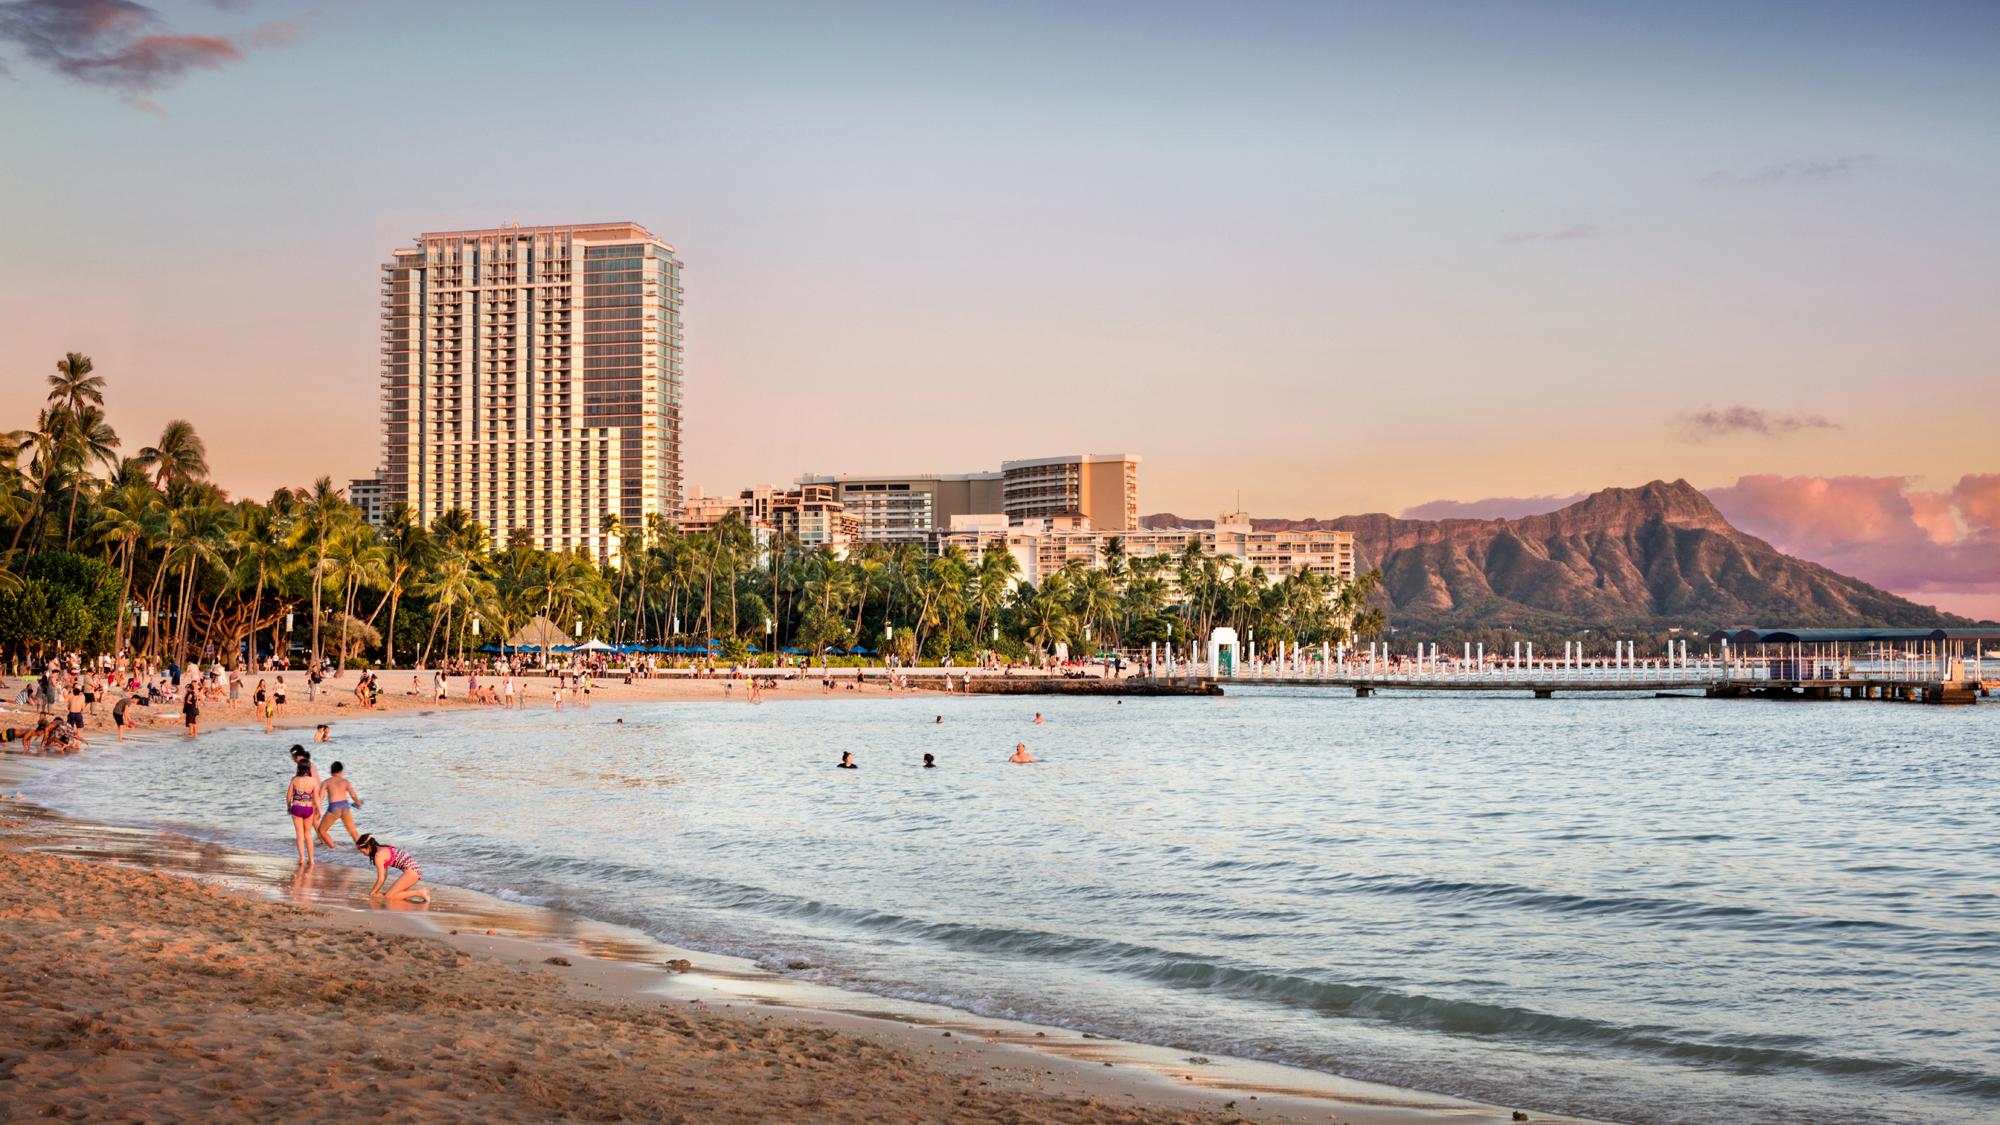 Trump International Hotel Waikiki Offers New Dining Options Travel Weekly